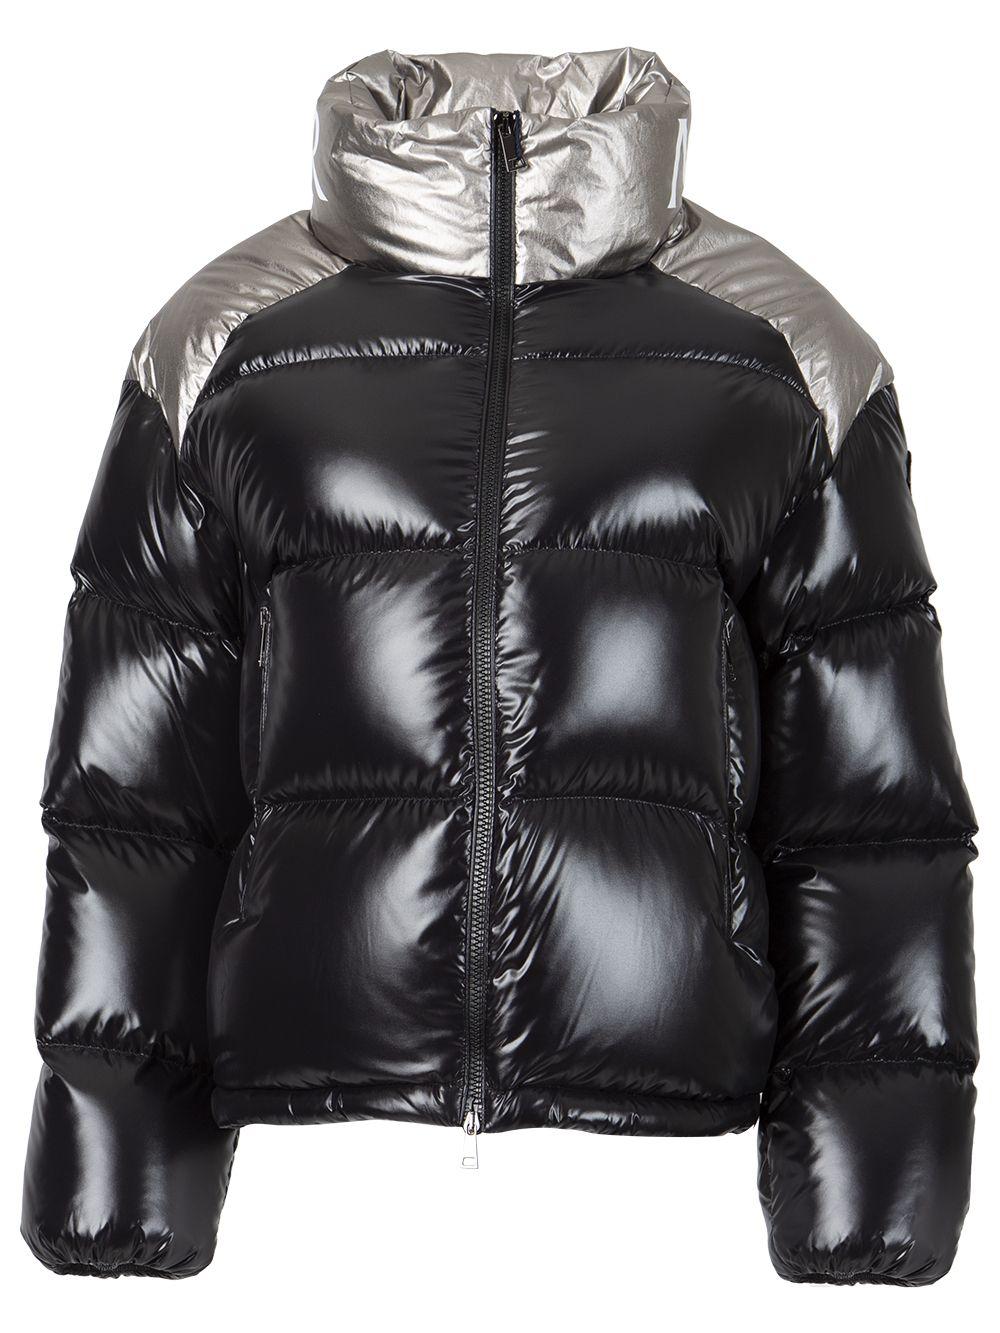 Cuscute Jacket Black